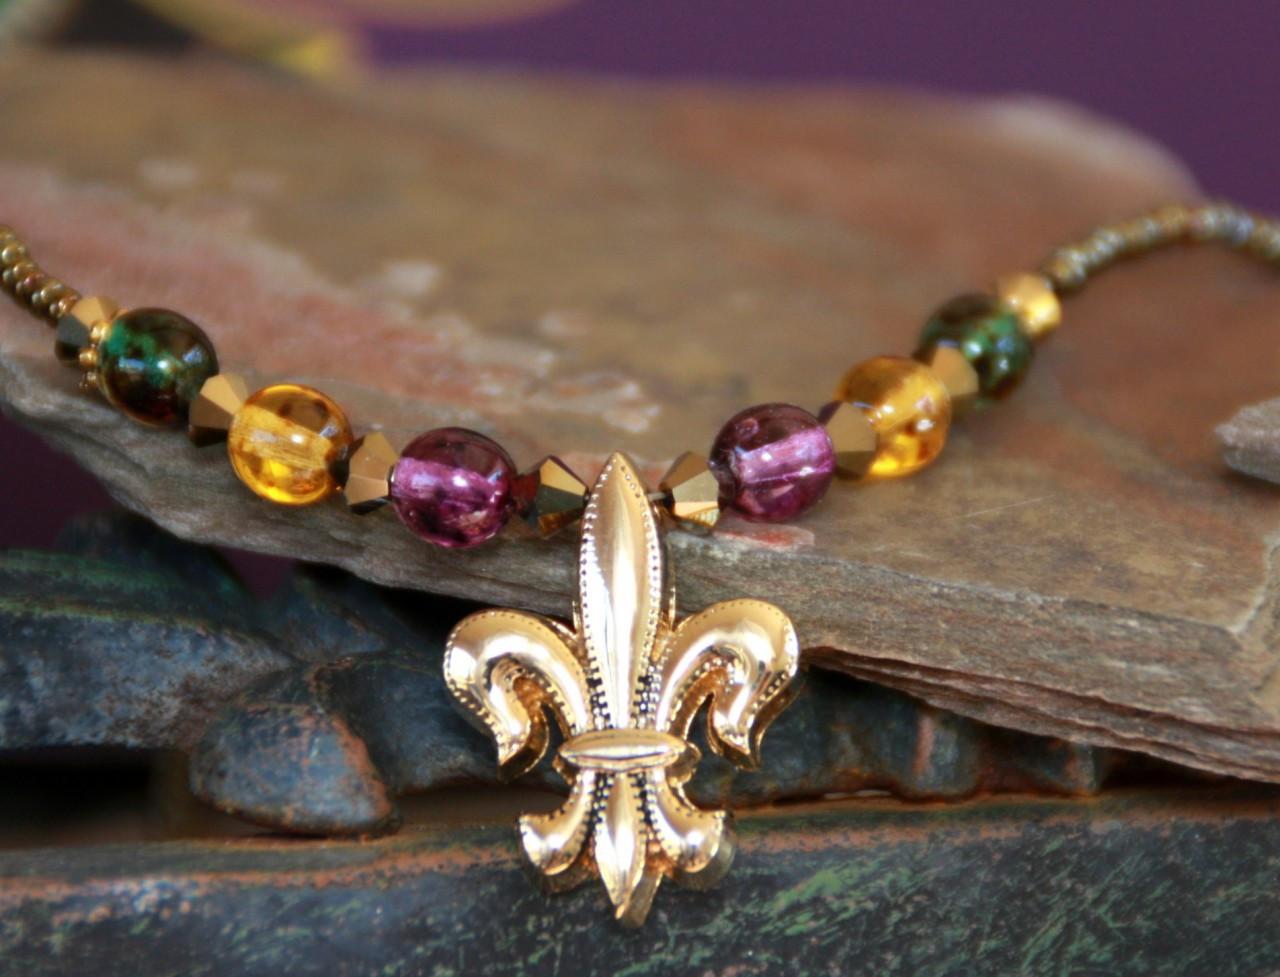 NCK-89 Mardi Gras Beaded Necklace